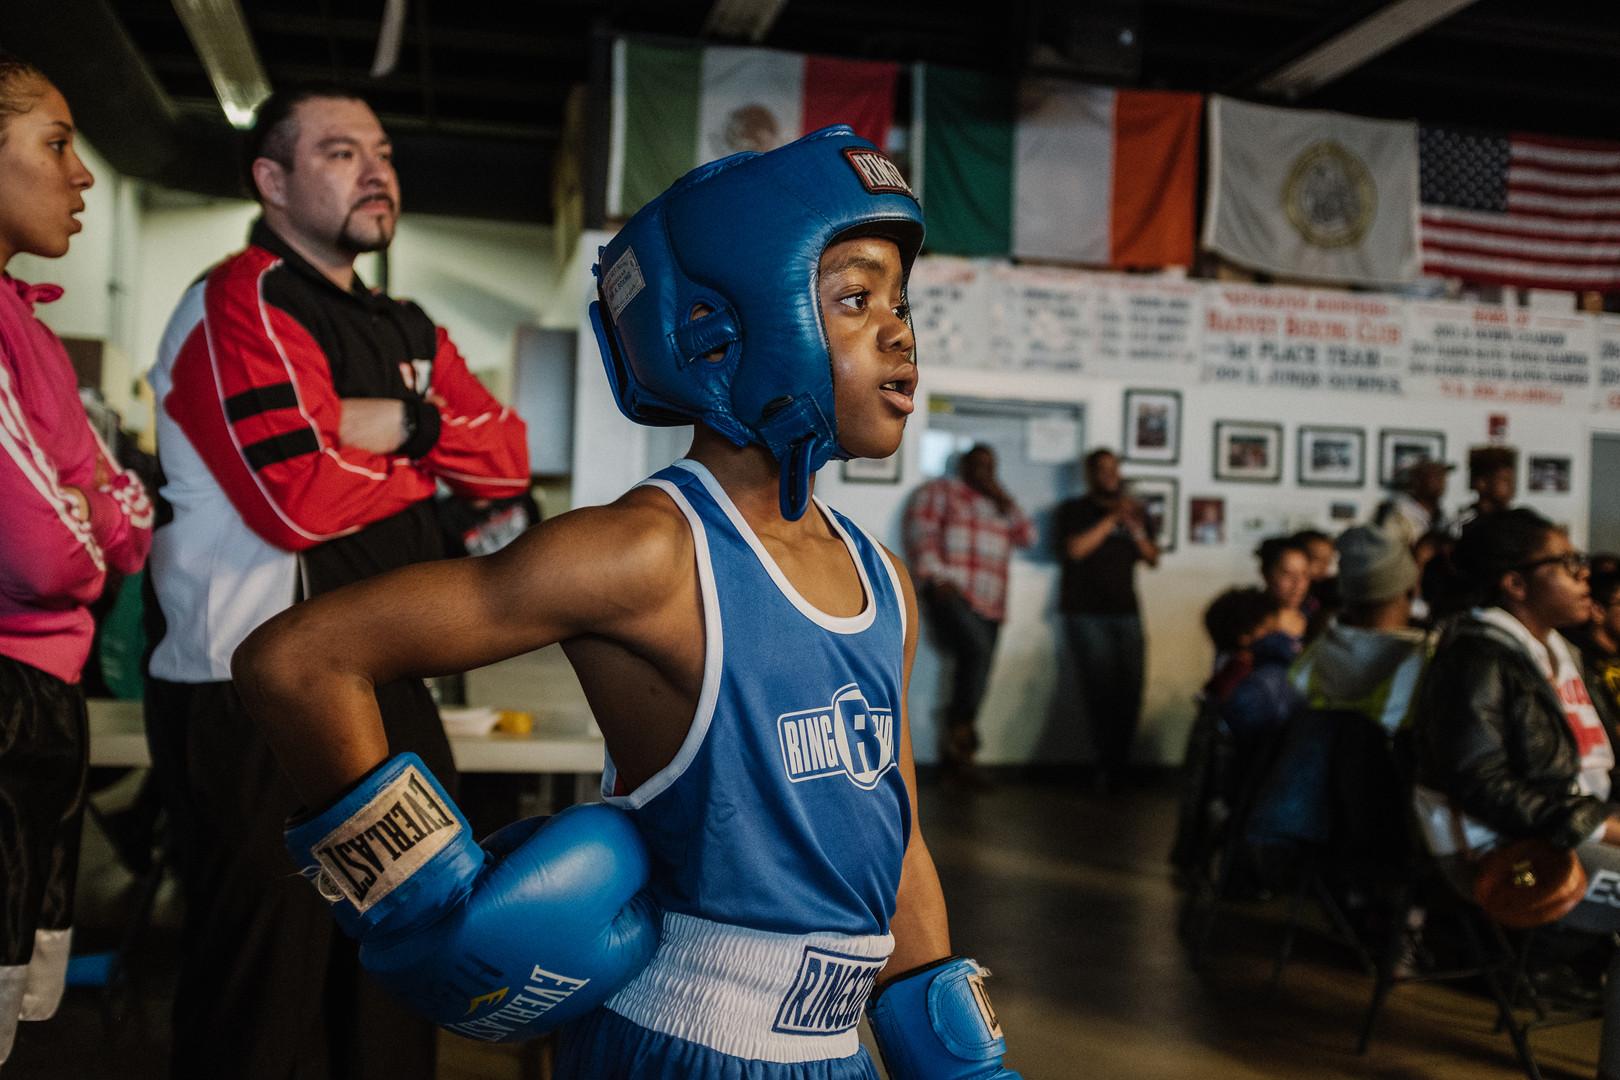 Harvey Boxing Club